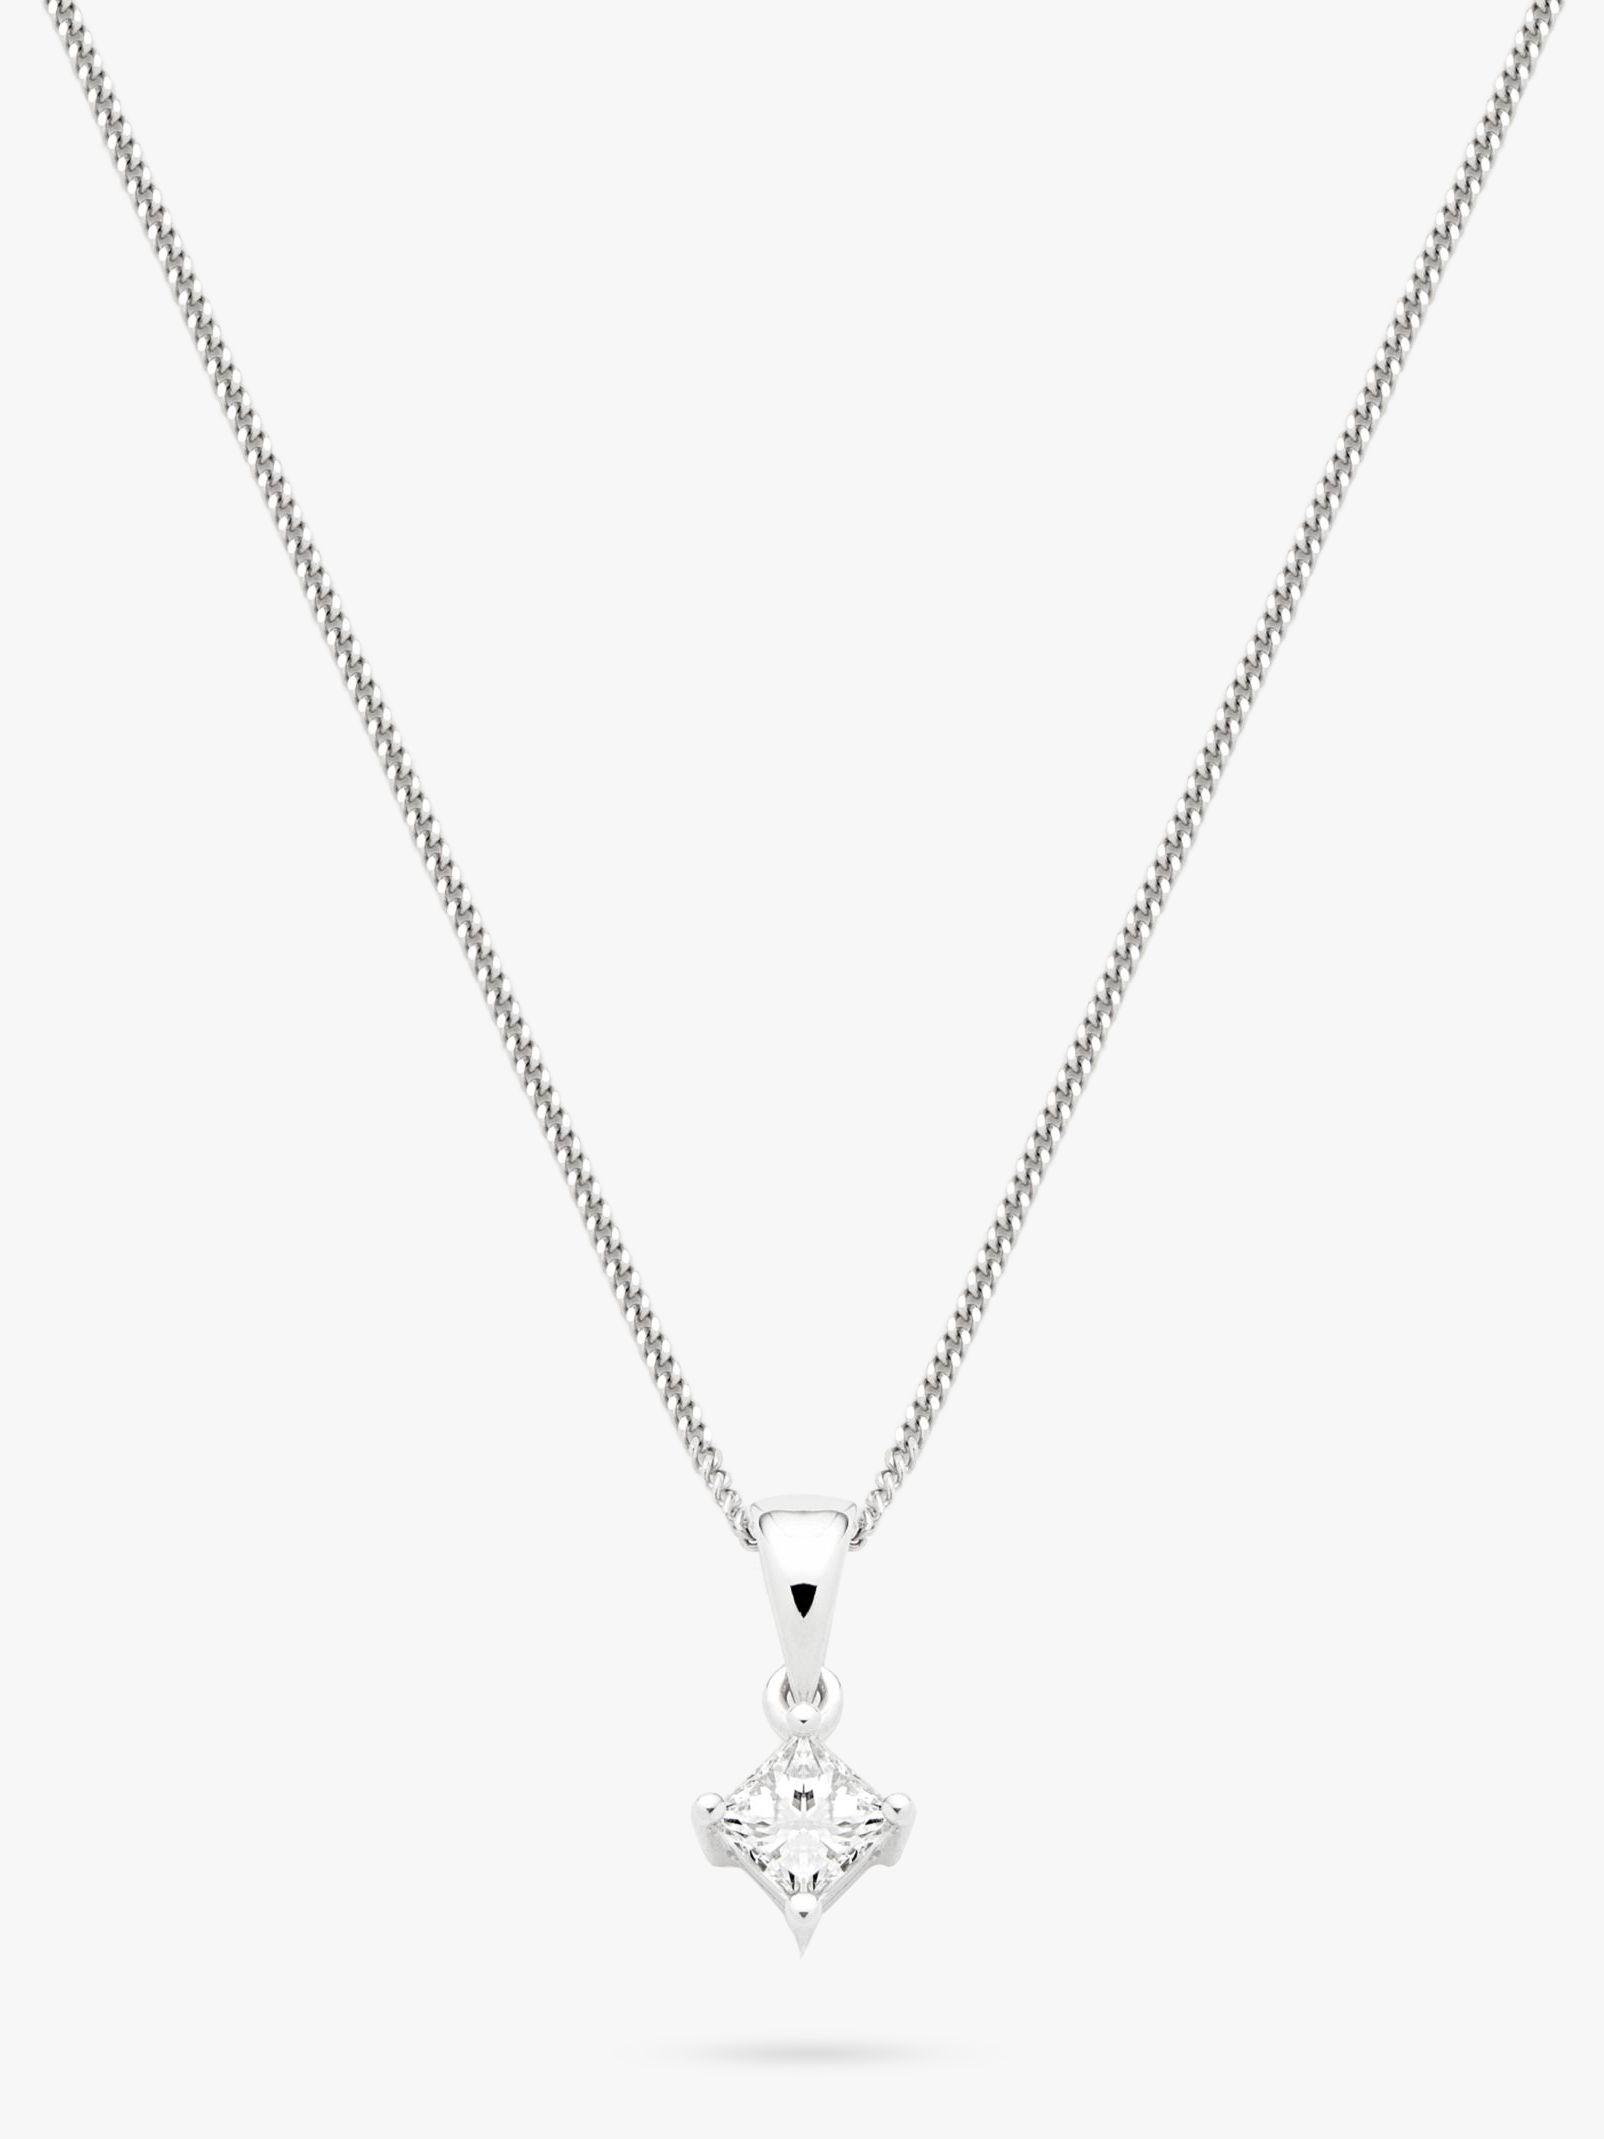 5d58eddfd Mogul 18ct White Gold Princess Cut Solitaire Diamond Pendant Necklace,  0.33ct at John Lewis & Partners